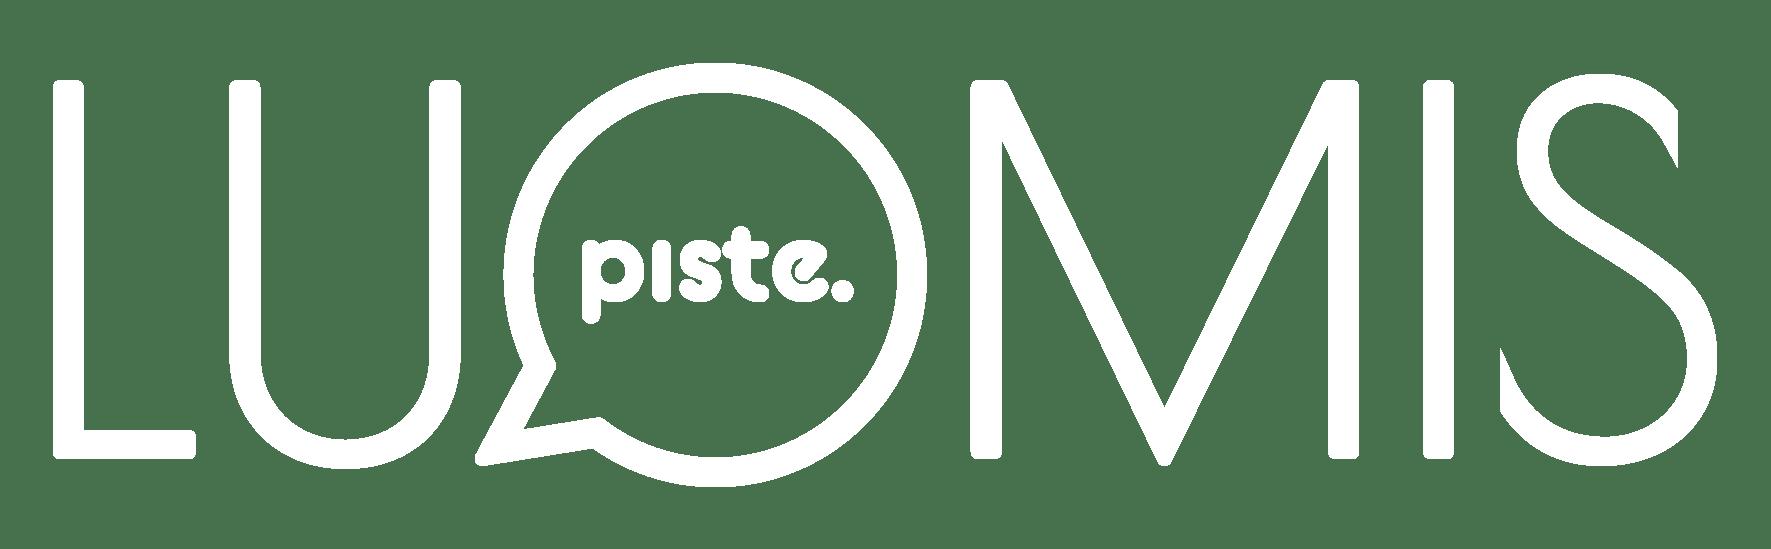 Luomispiste logo